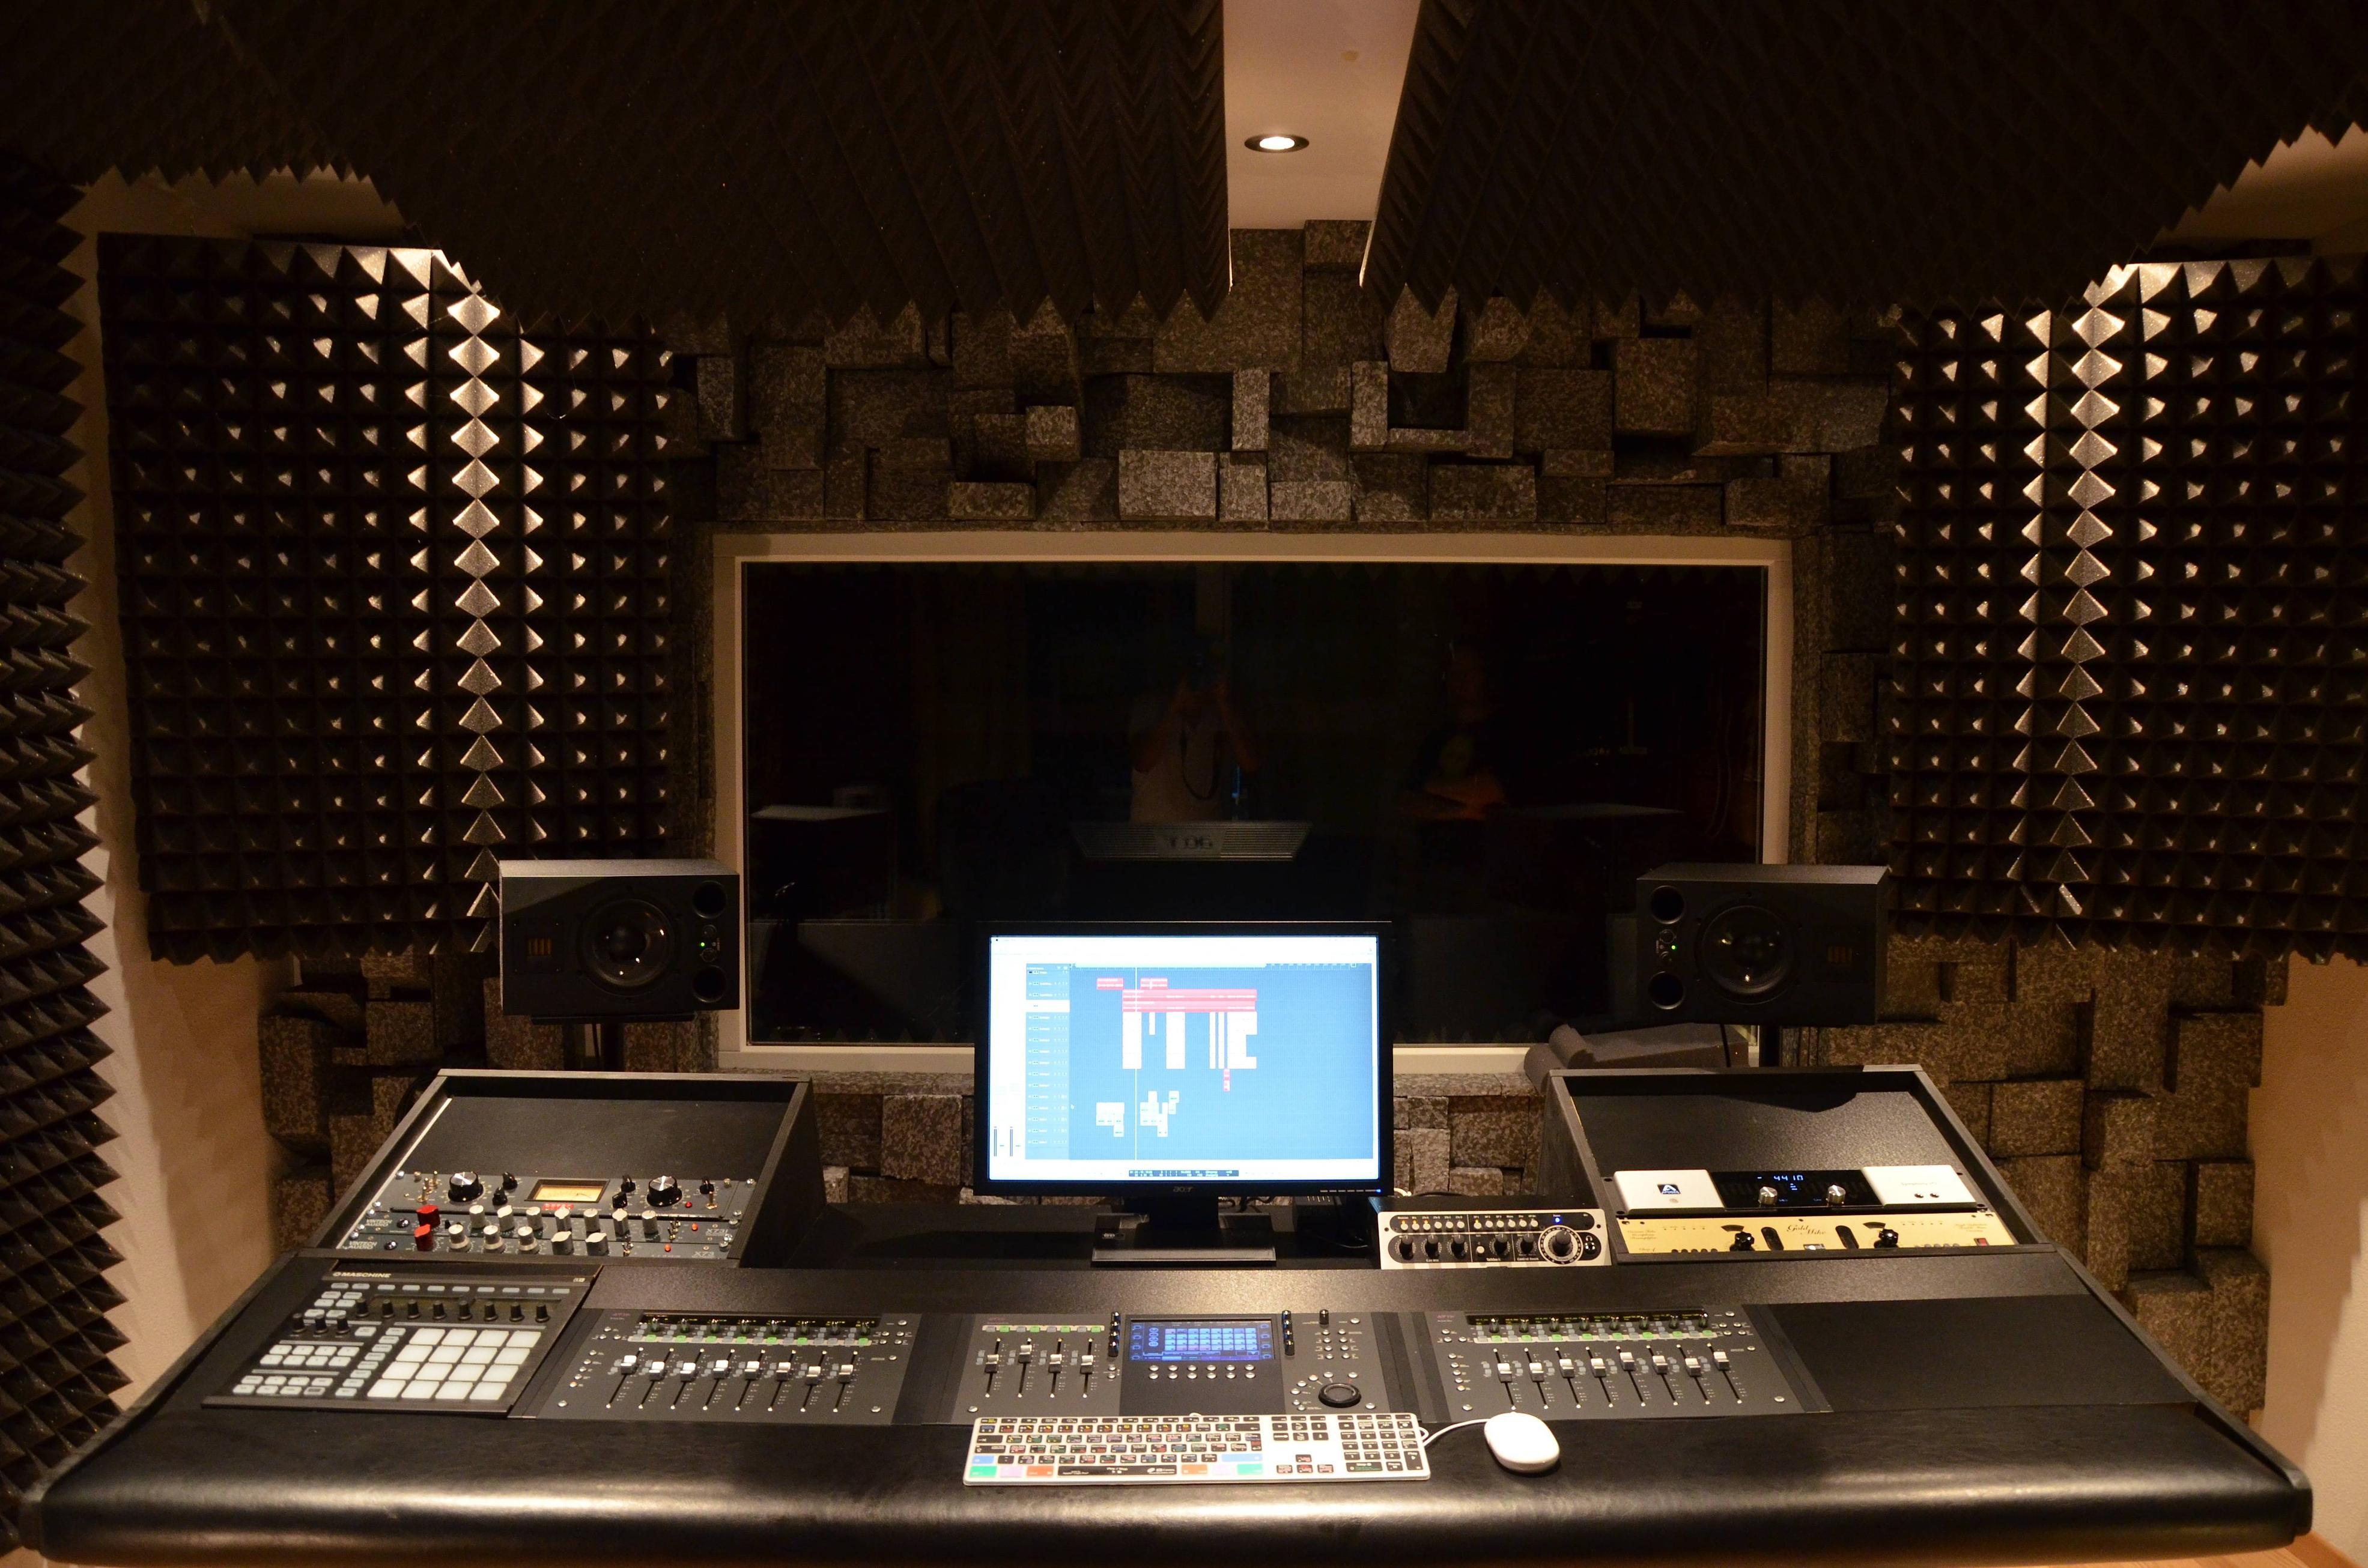 recording studio wallpaper 49283264 High Definition Wallpaper 3942x2611